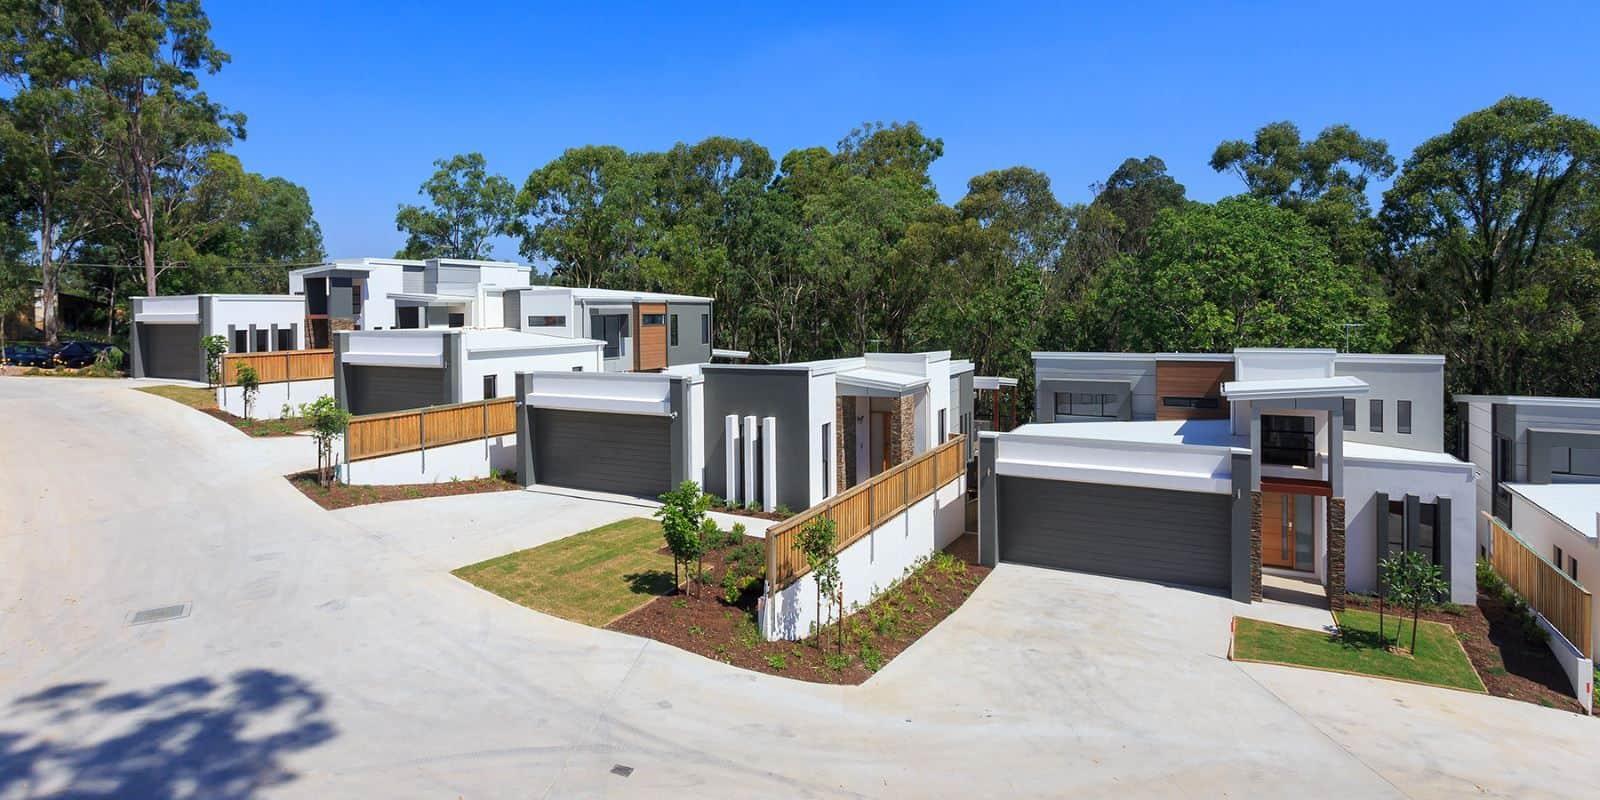 Homes in the Metacap Development at Kenmore